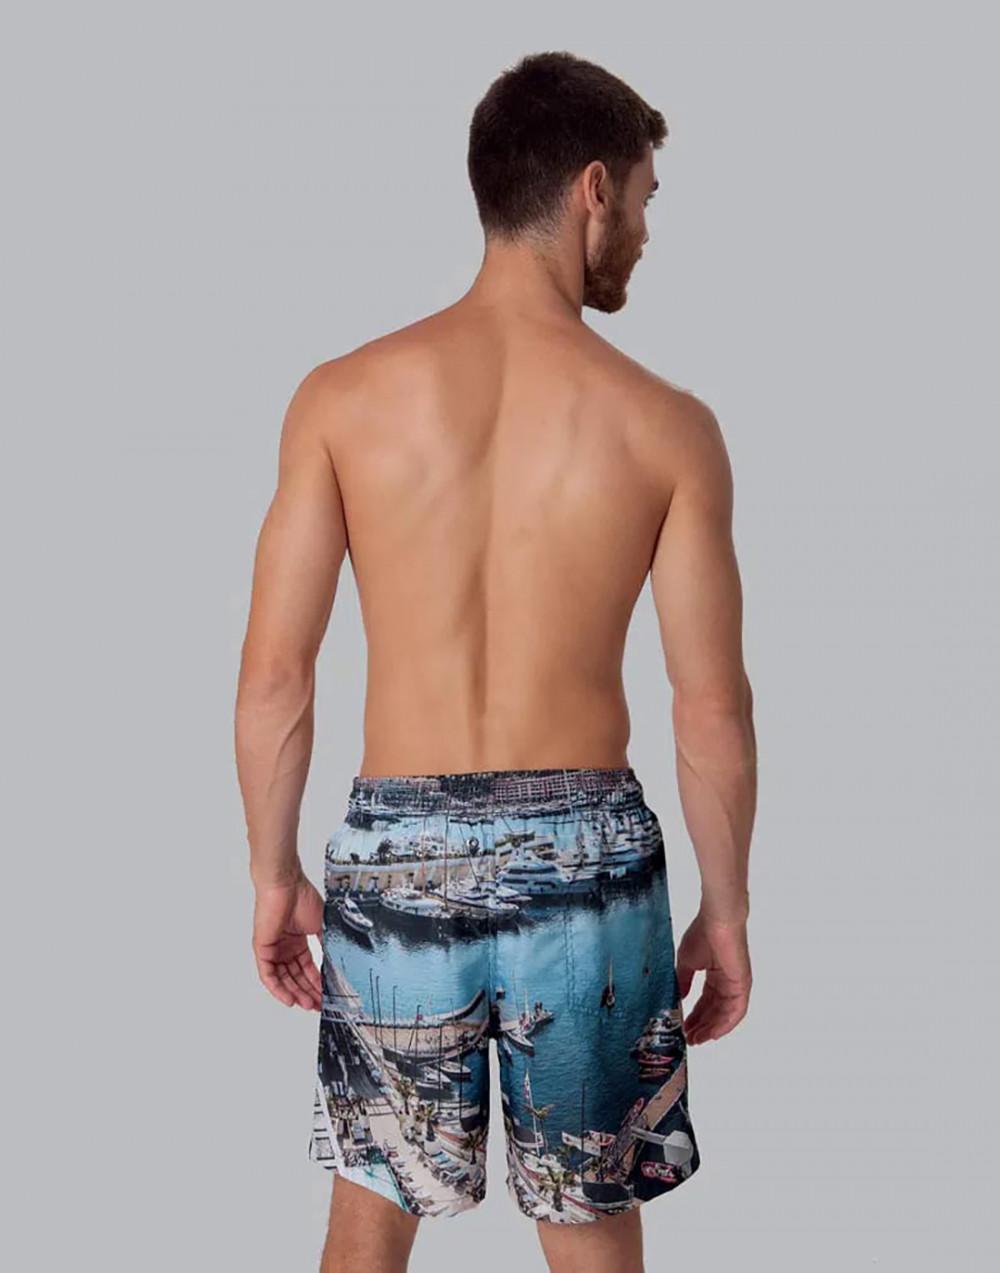 Shorts Estampado Paisagens FPS 30 Mash